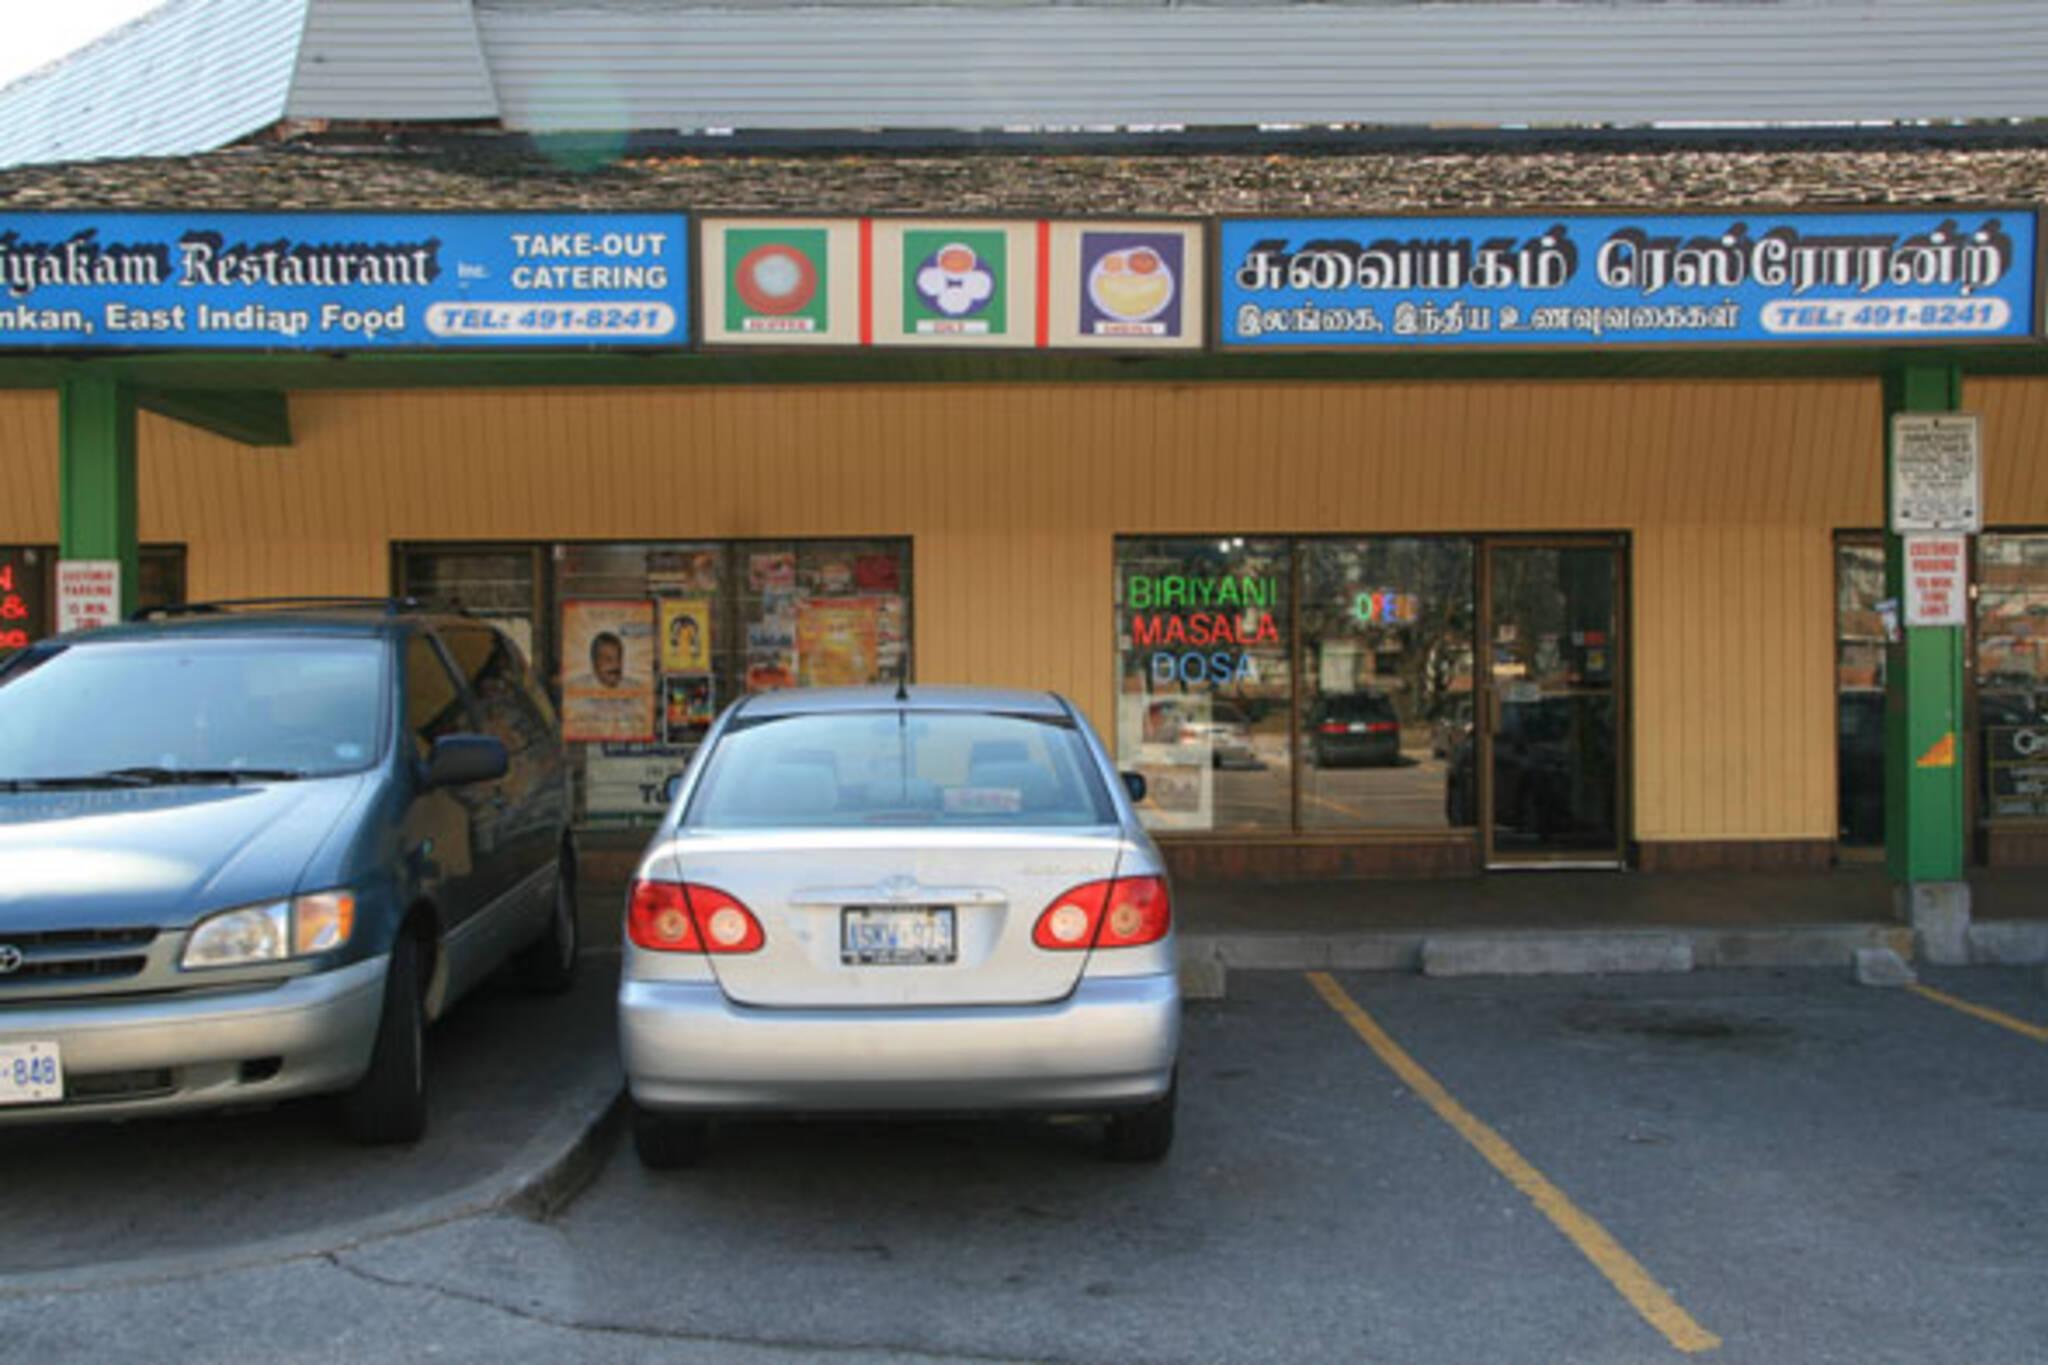 Suvaiyakam Restaurant